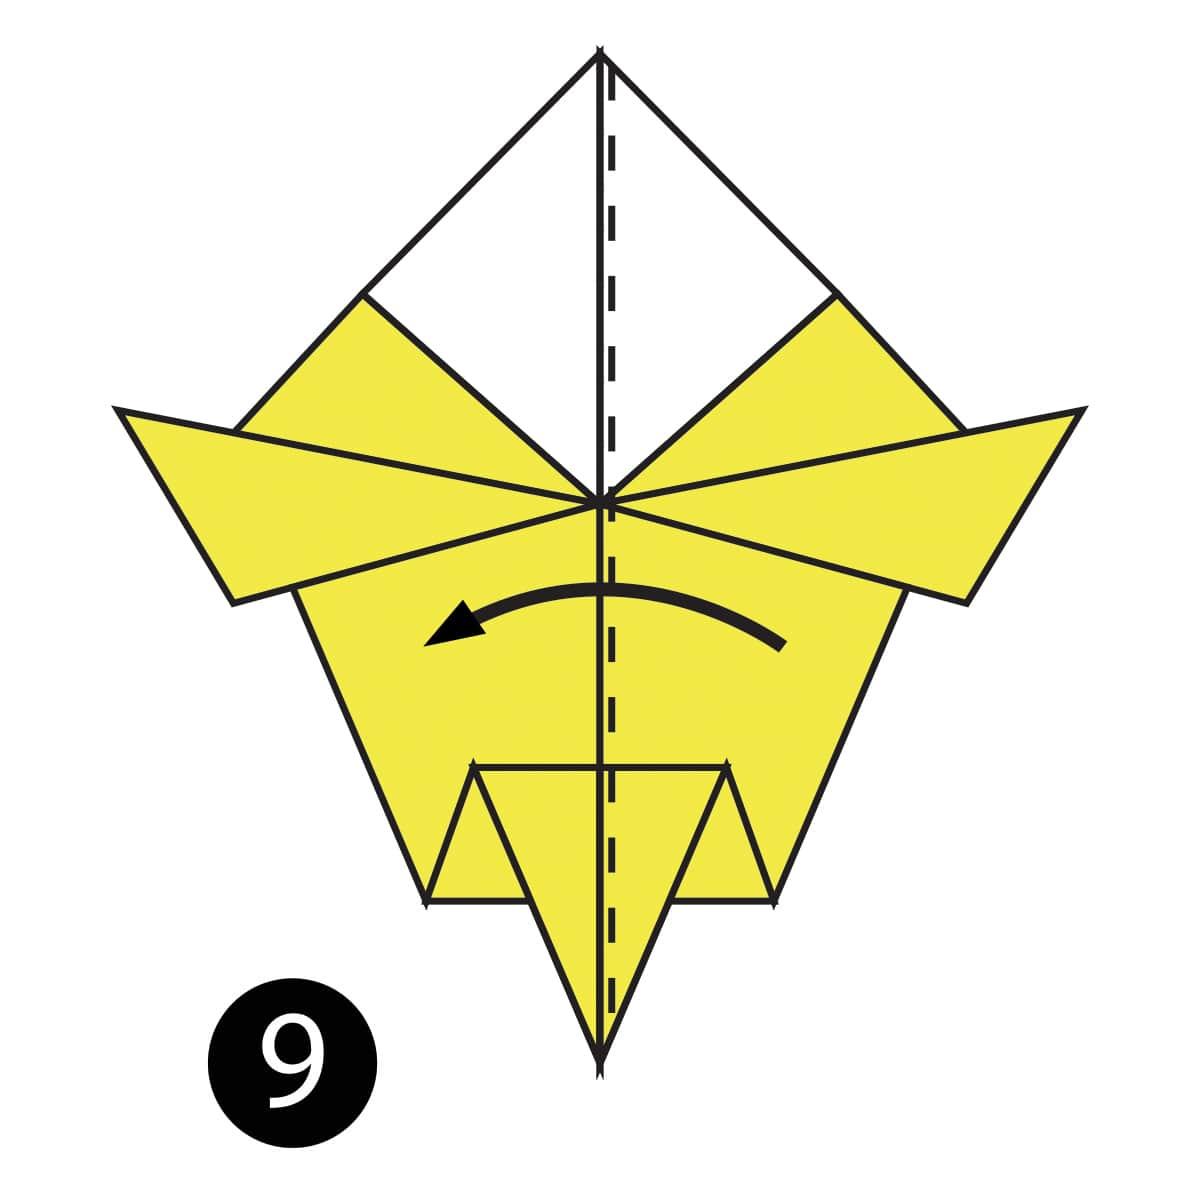 Bird Step 9